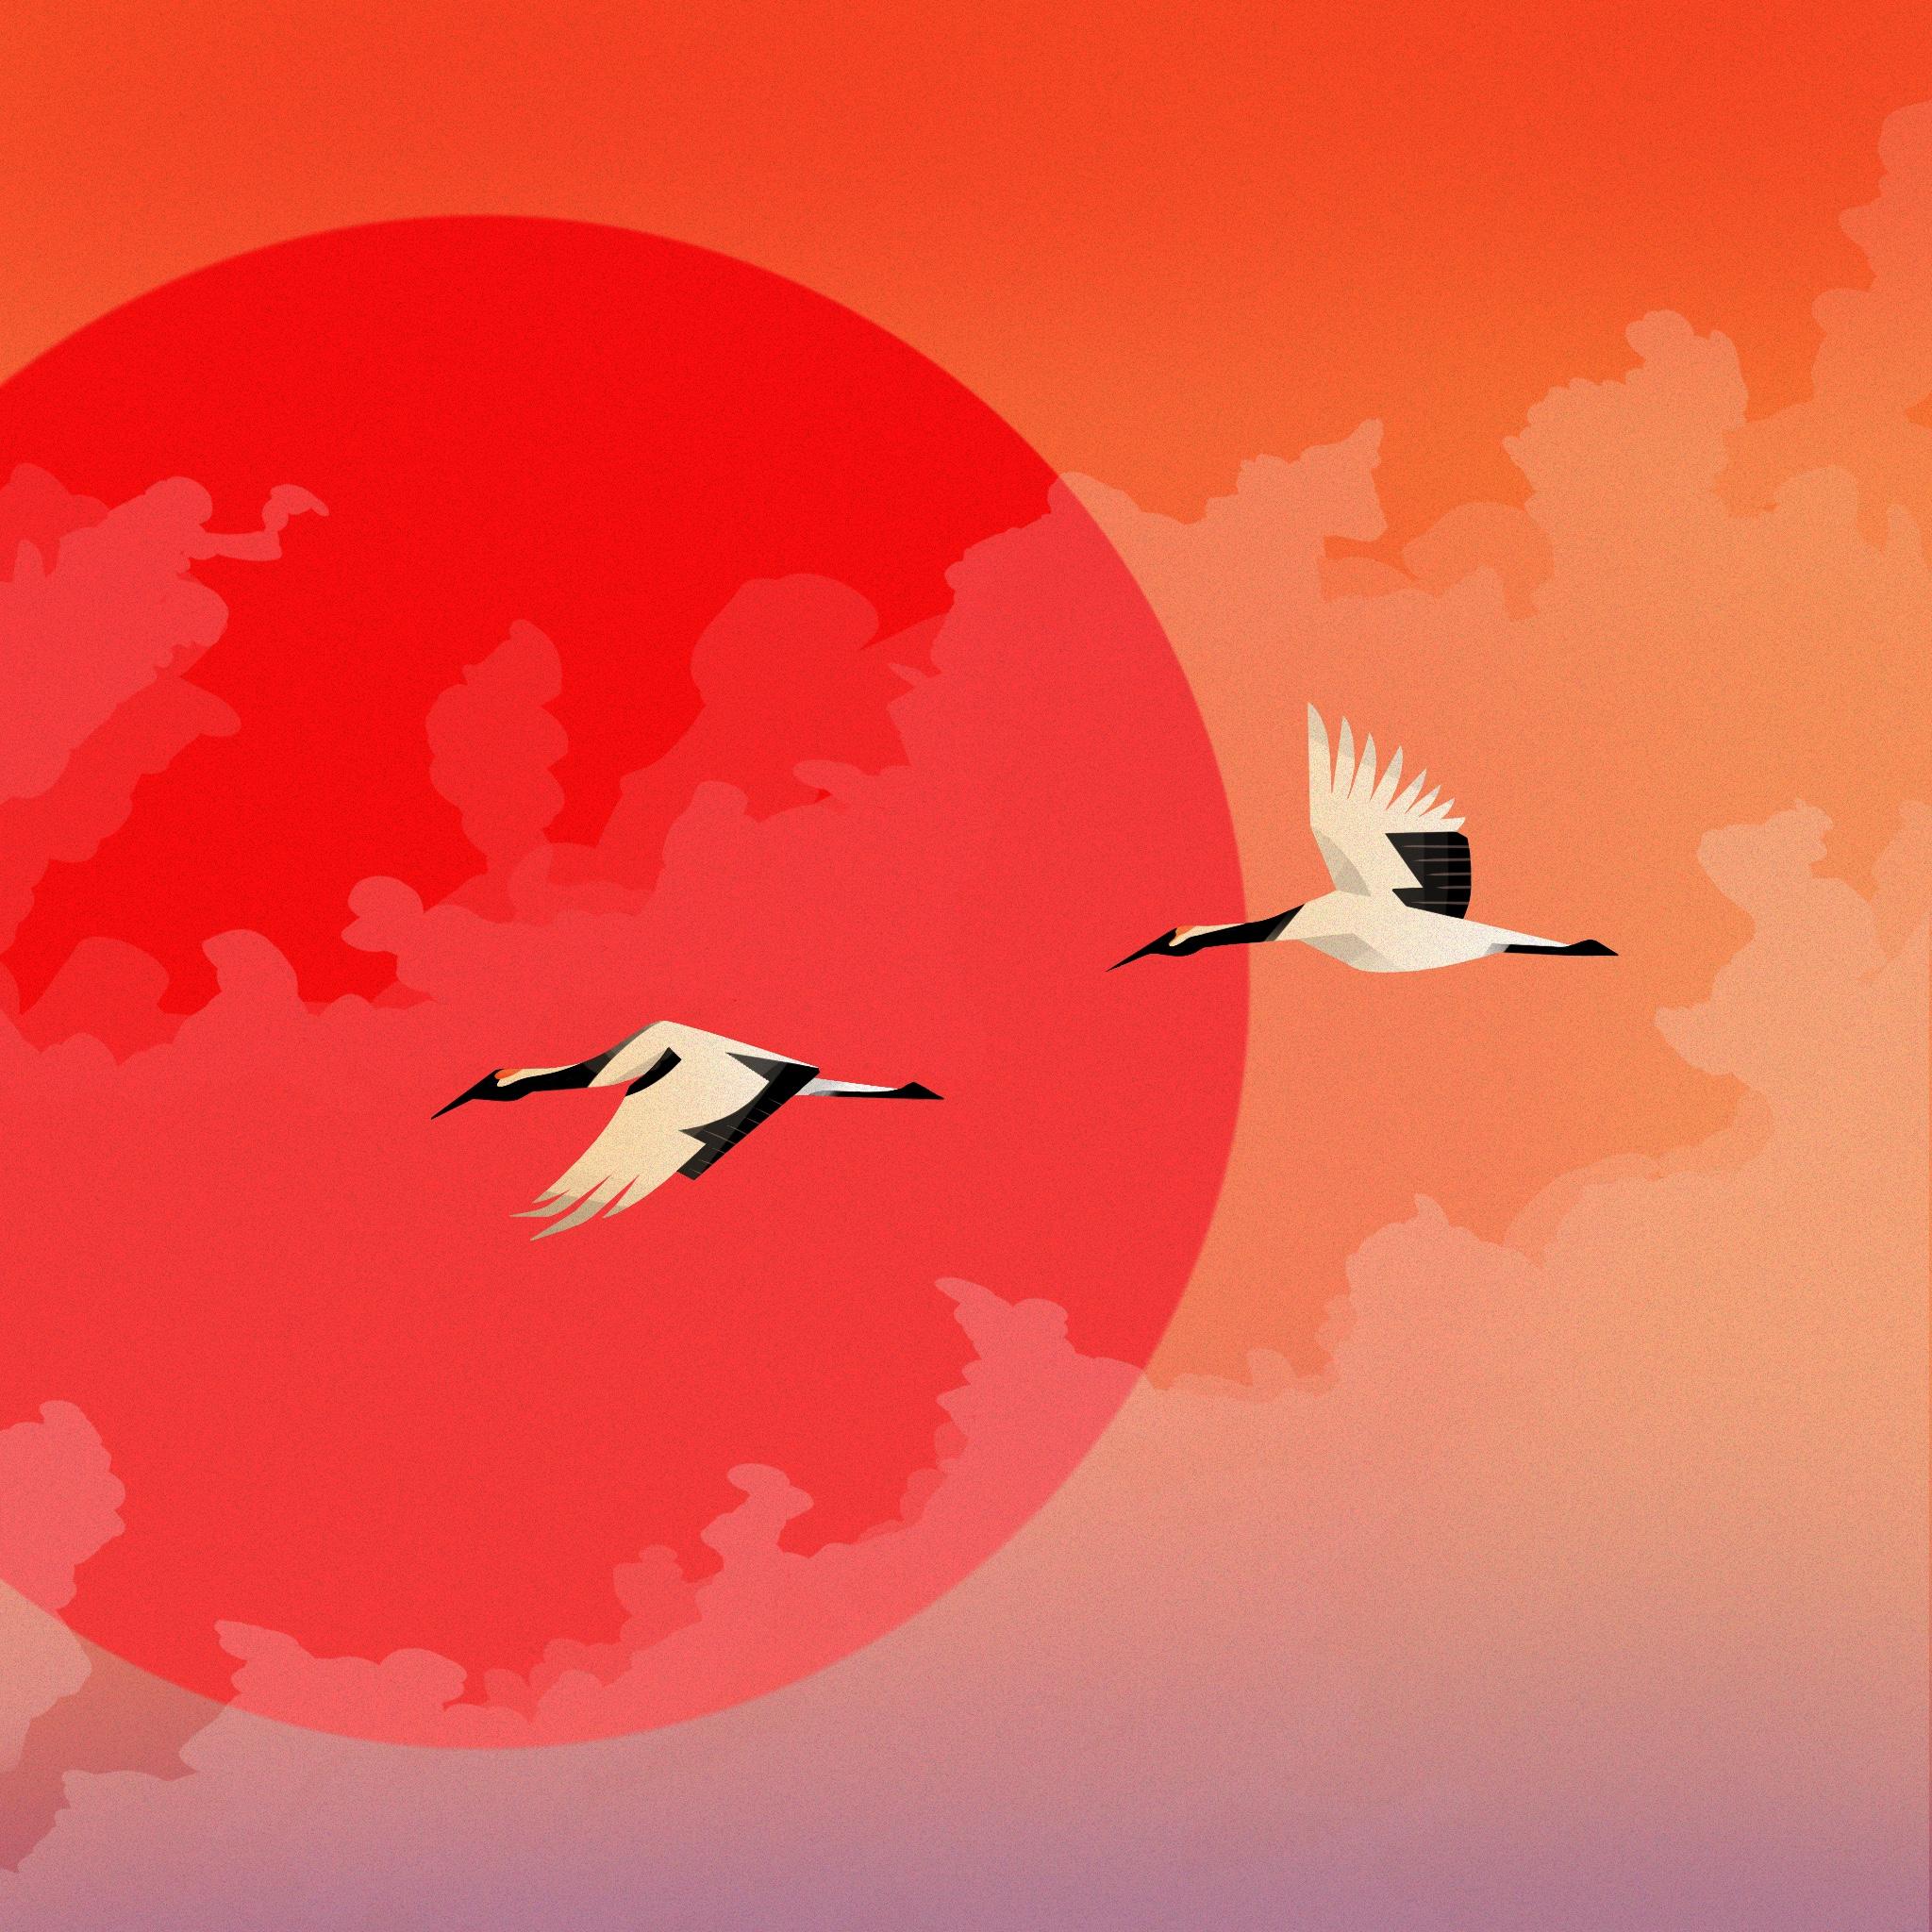 Red-Crowned Cranes Illustration